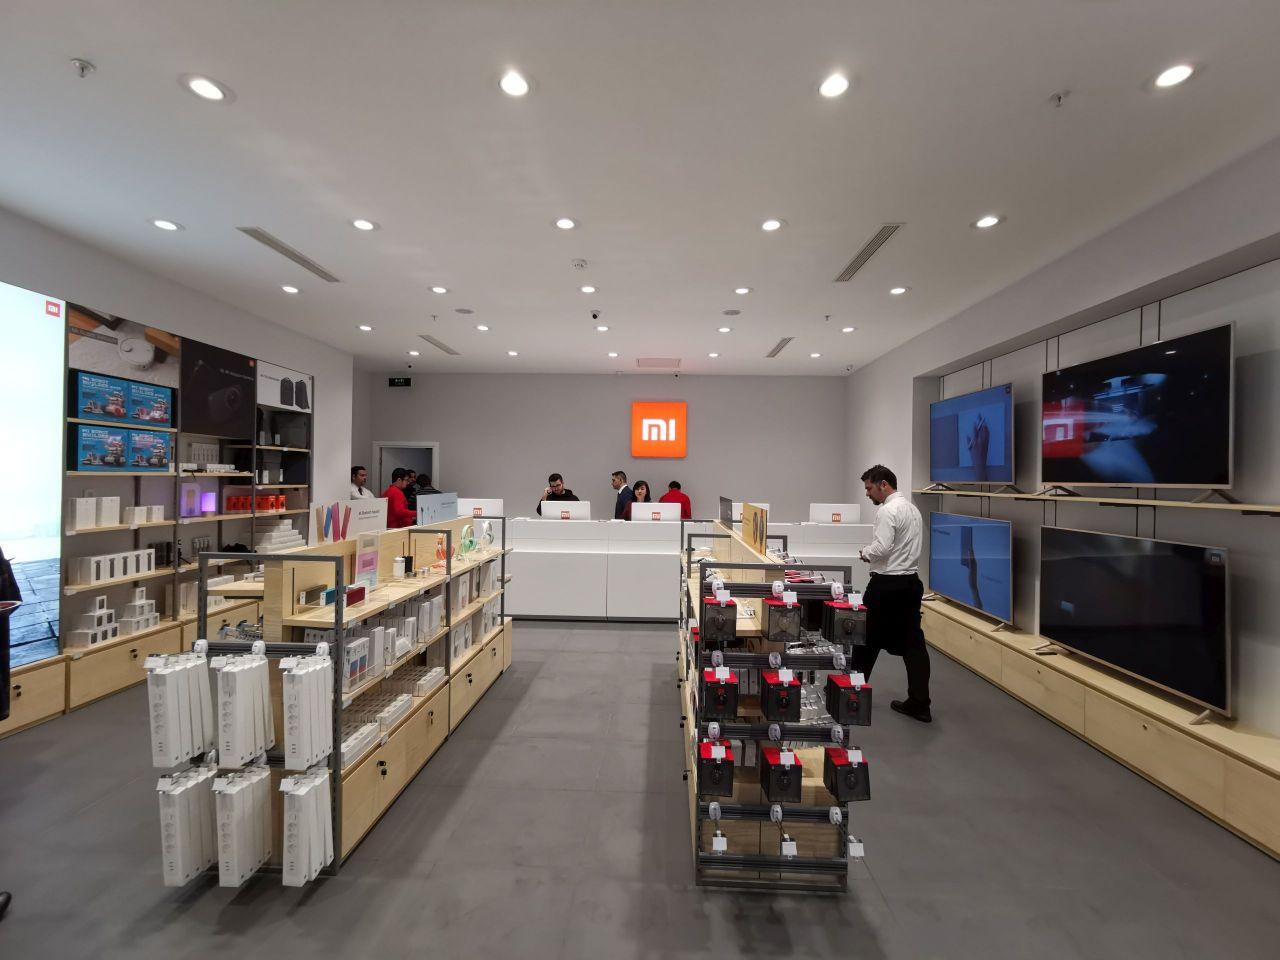 Xiaomi Forum İstanbul mağazasını gezdik! - Page 1